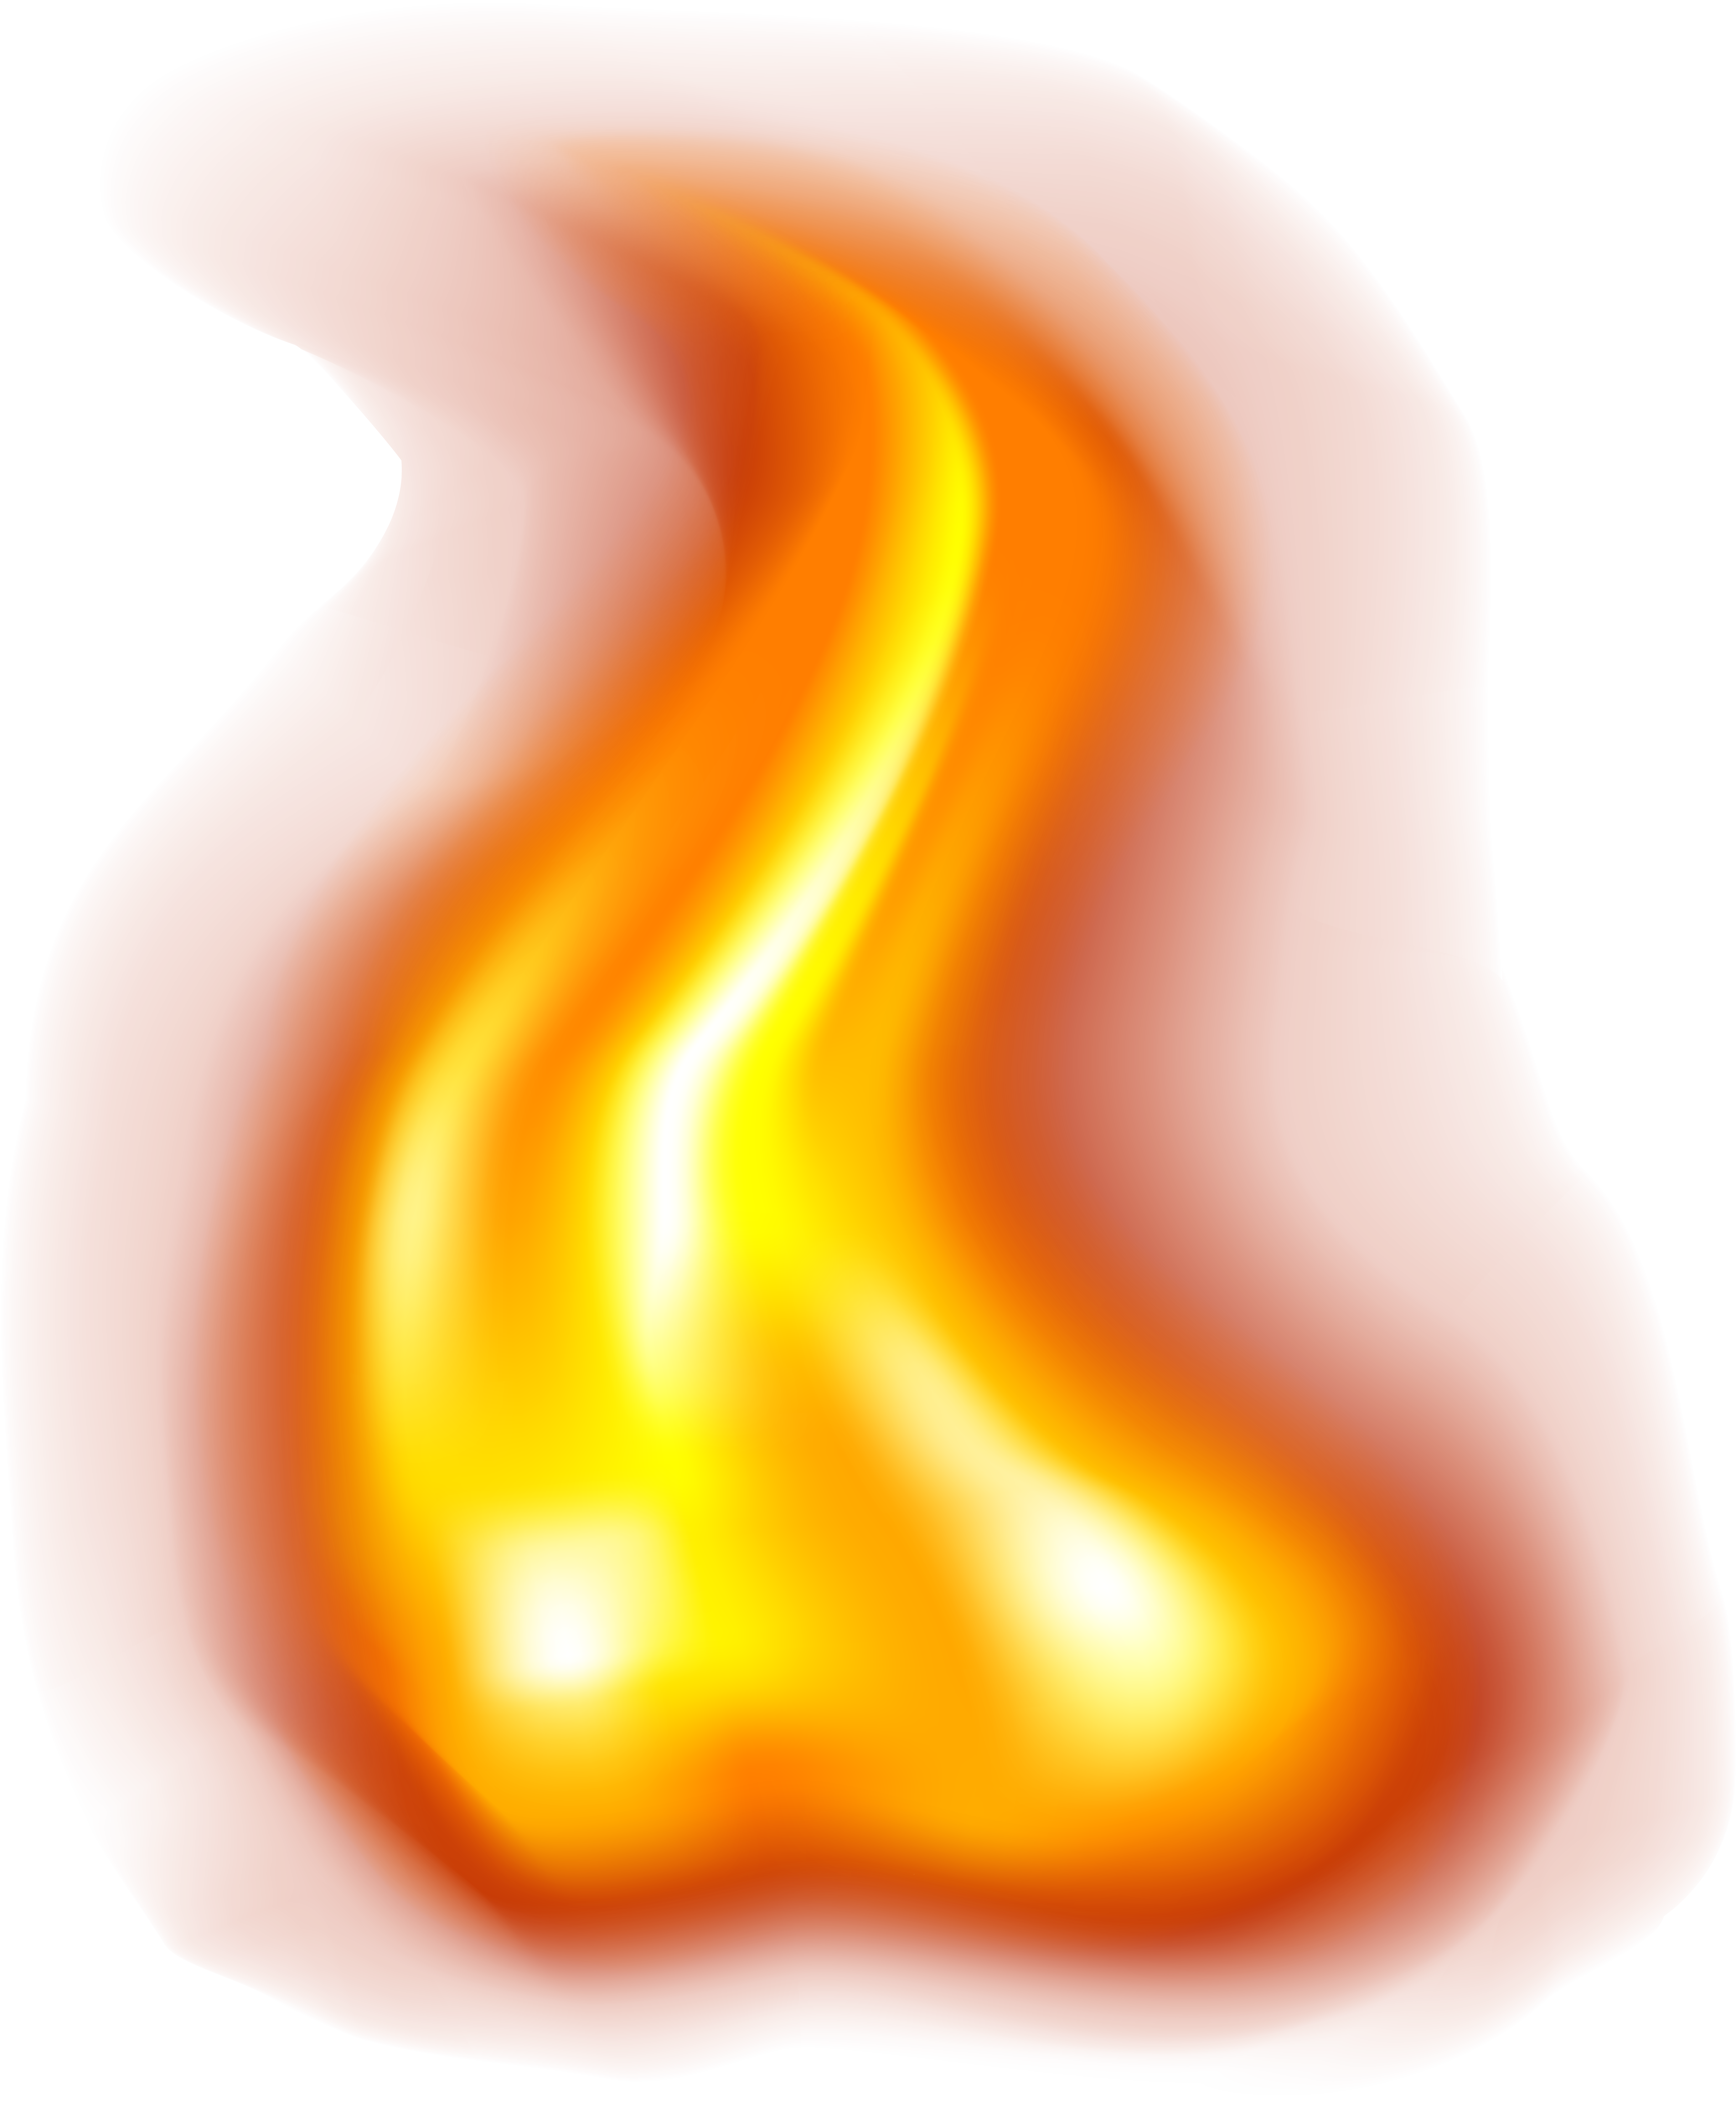 Flame transparent png clip. Flames clipart fire flower